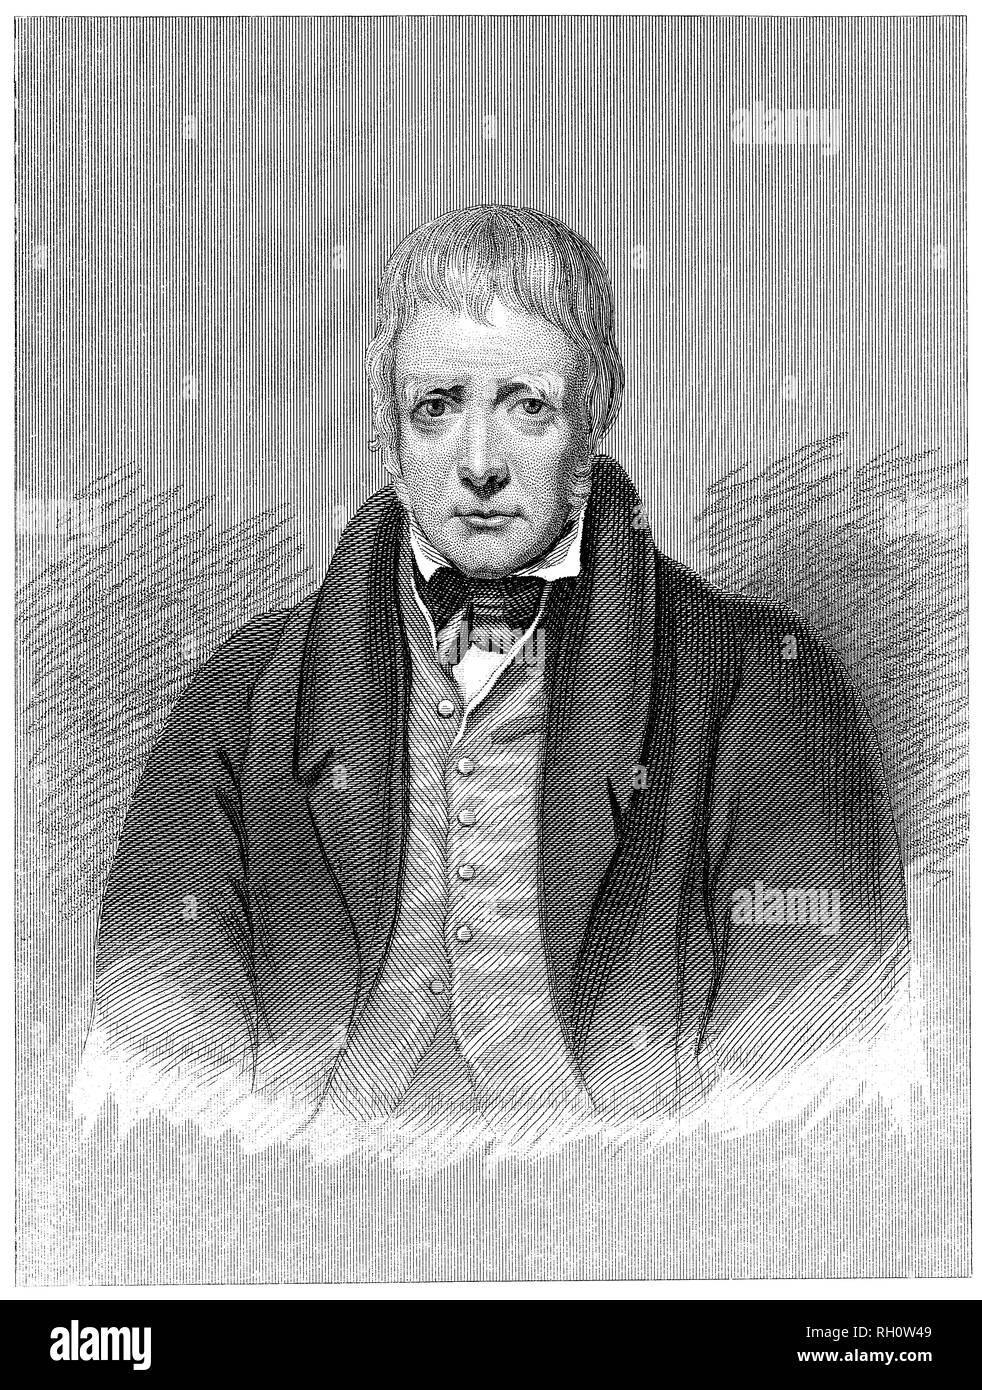 1853 vintage grabado de Sir Walter Scott. Imagen De Stock